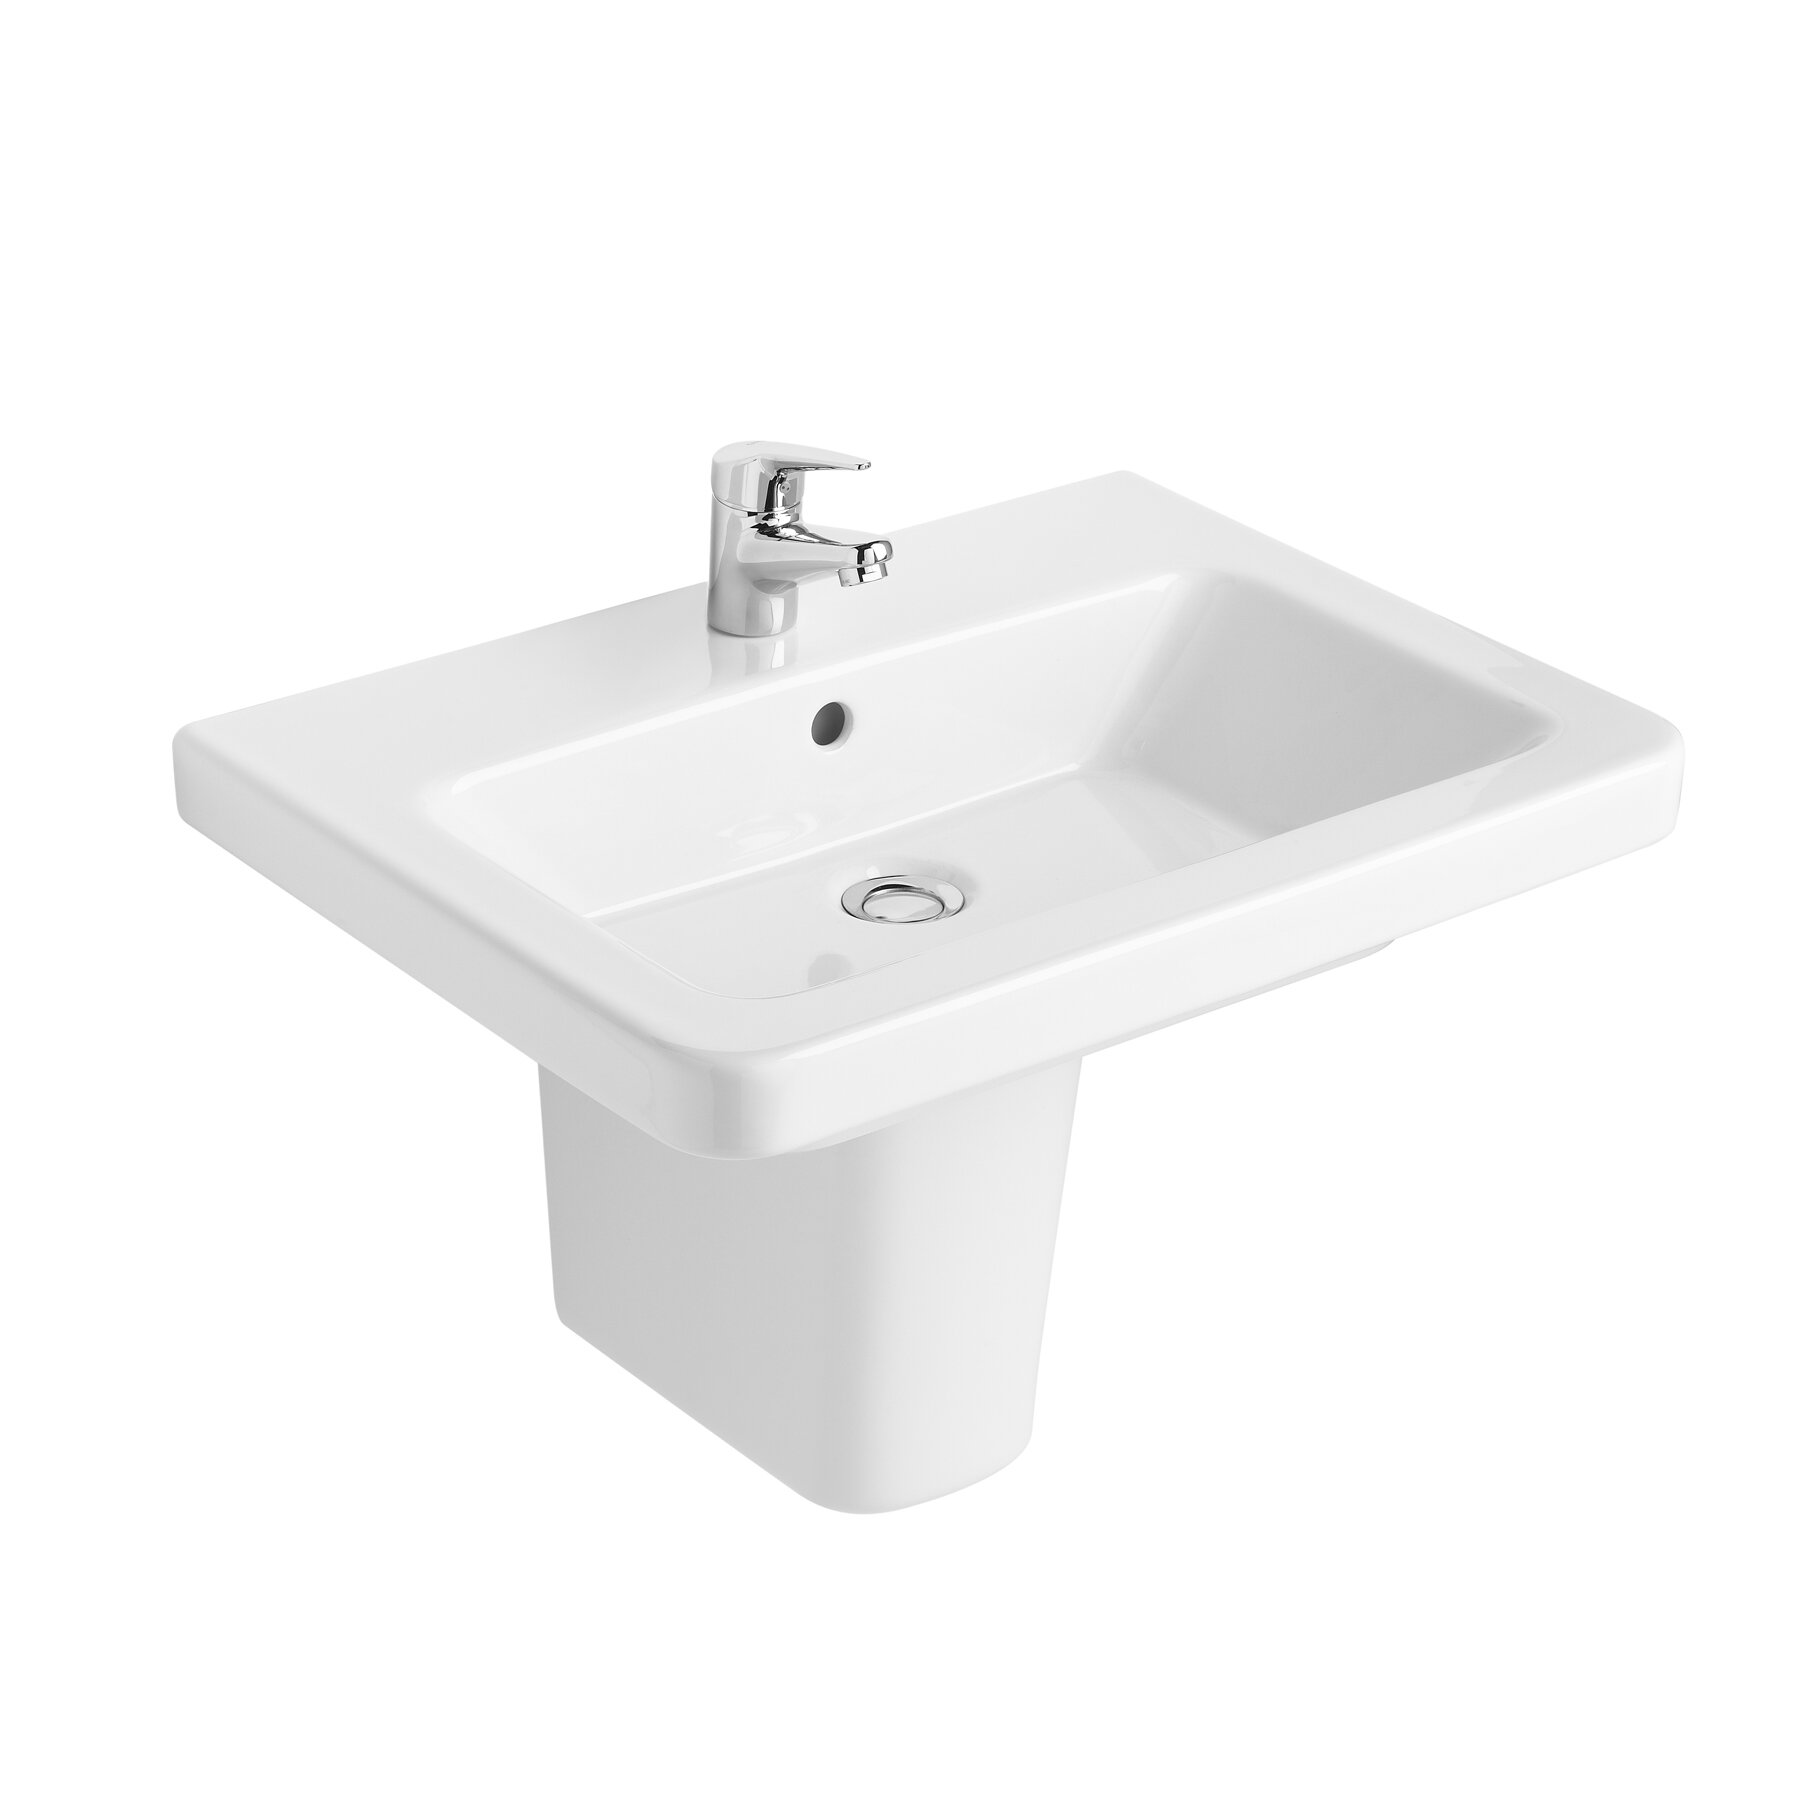 Bissonnet Universal Street 55 Semi-Pedestal Bathroom Sink Wayfair